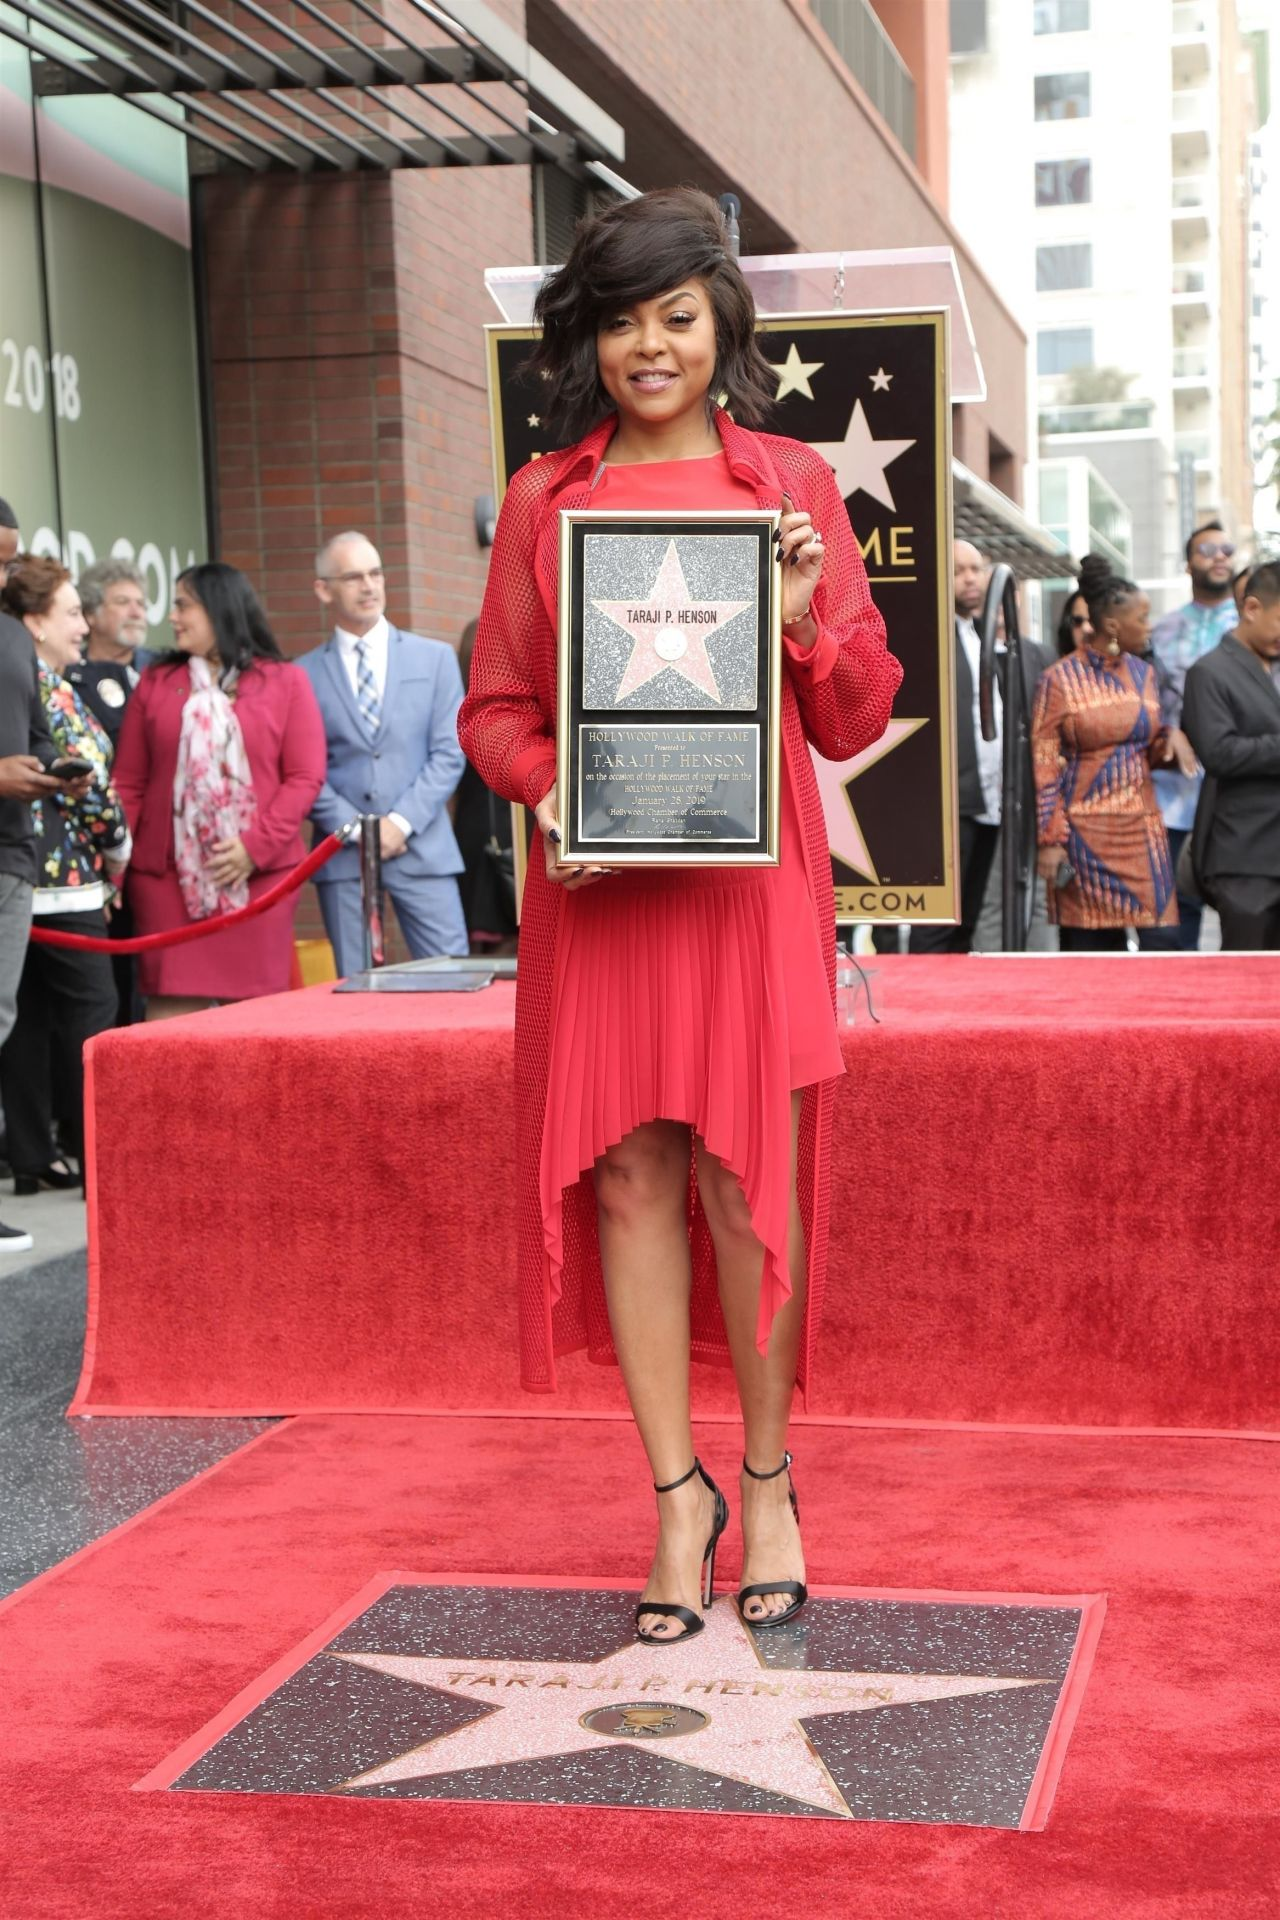 Taraji P Henson Honored With Asstar On The Hollywood